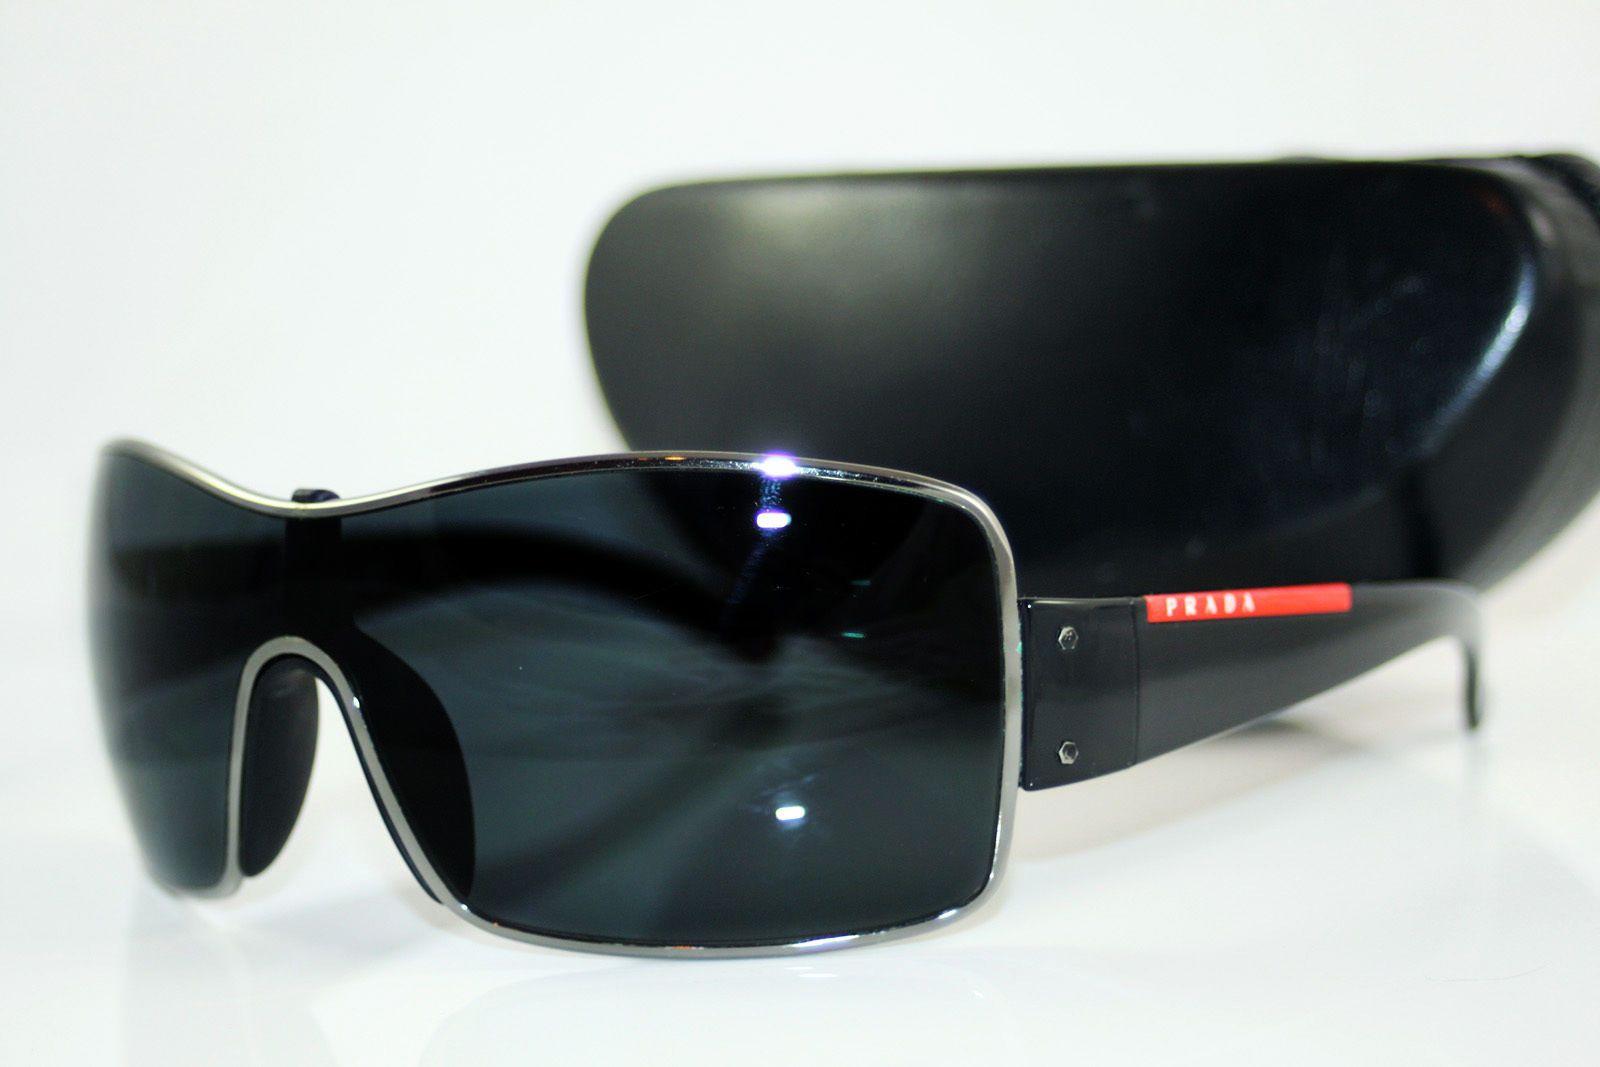 dbbb9e53fb7 Prada Sunglasses (Men s Pre-owned Designer Executive Luxury Aviator Black  Sun Glasses with Red Designer Logo Stripe)